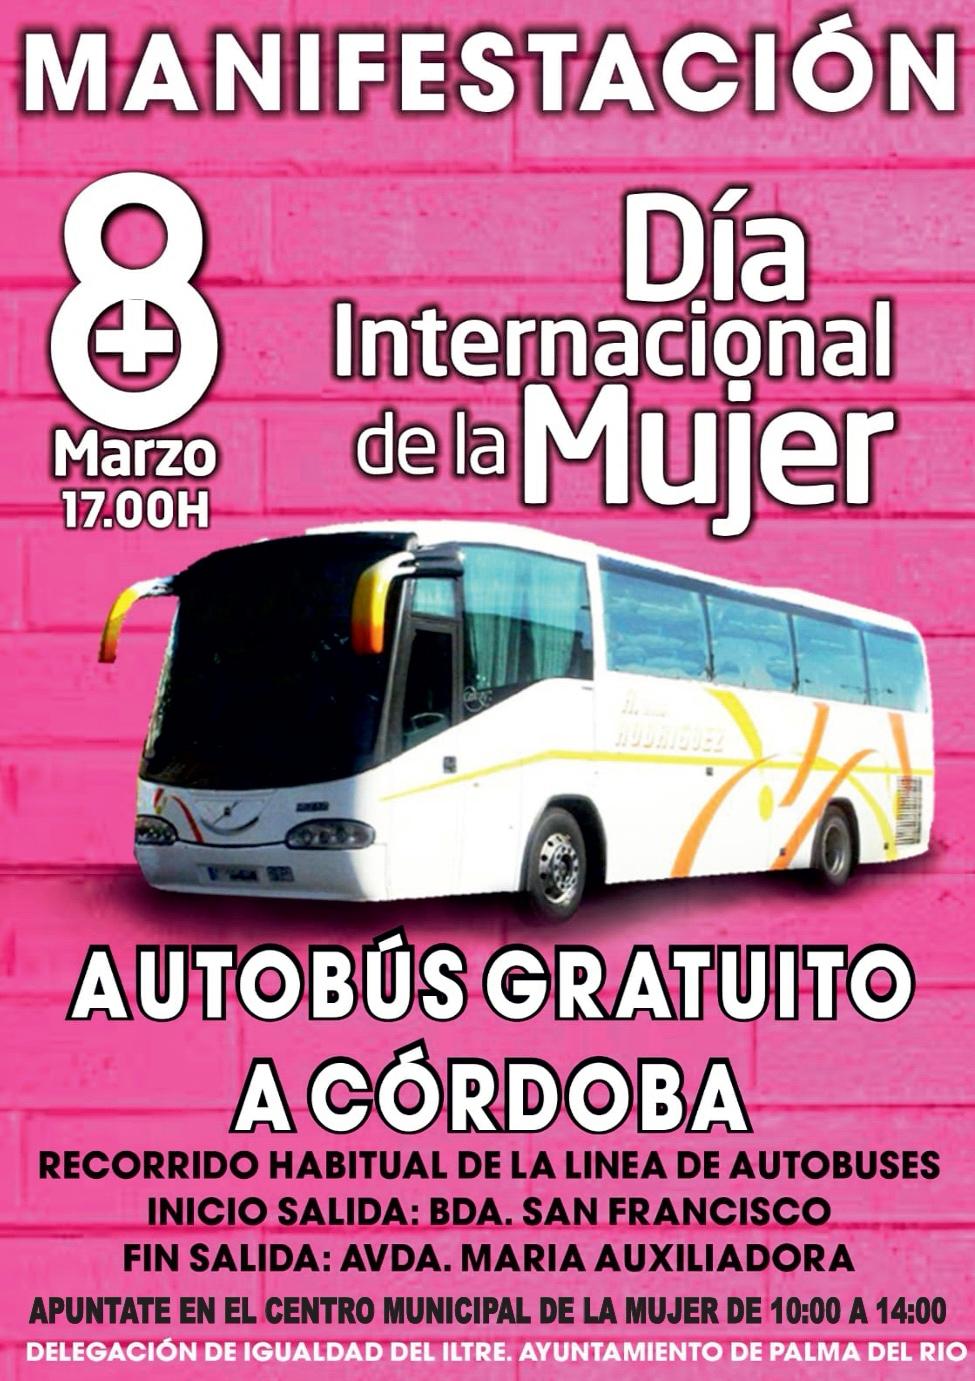 https://www.palmadelrio.es/sites/default/files/autobus_manifestacion_mujer_2019.jpg